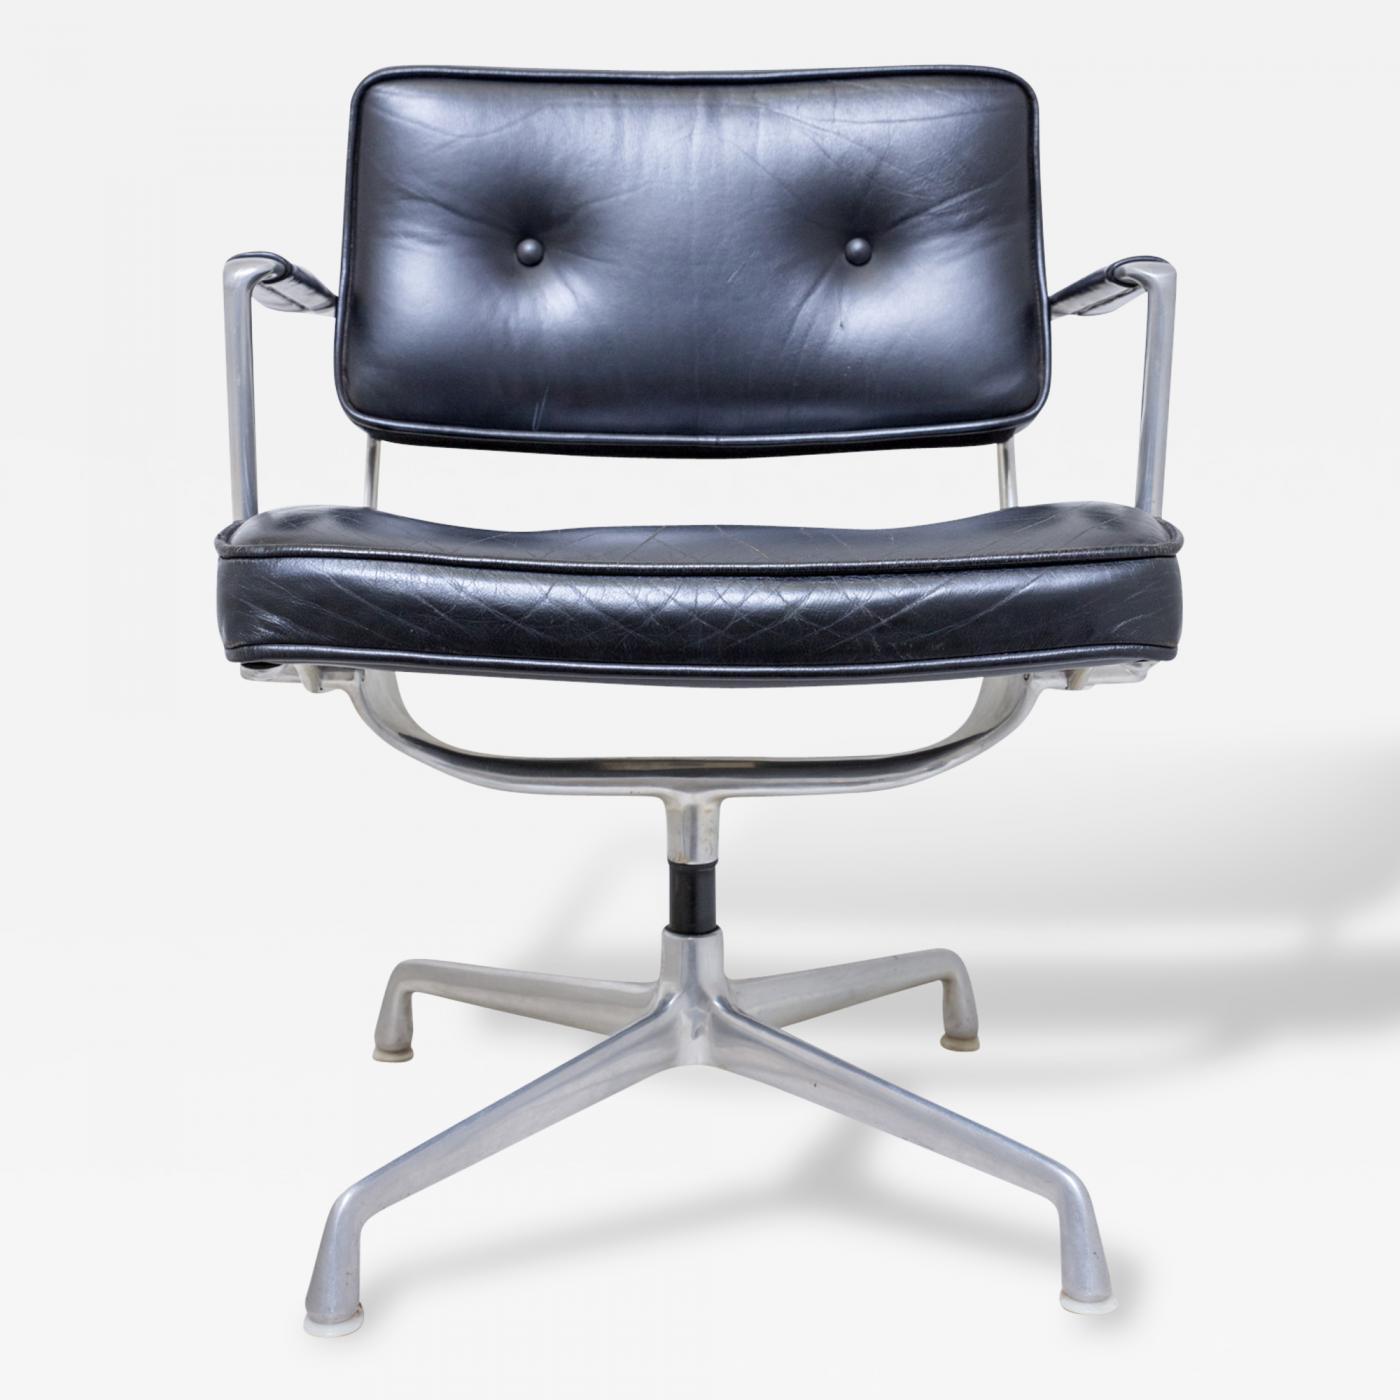 Charles Eames Very Rare Herman Miller Eames Model ES 102